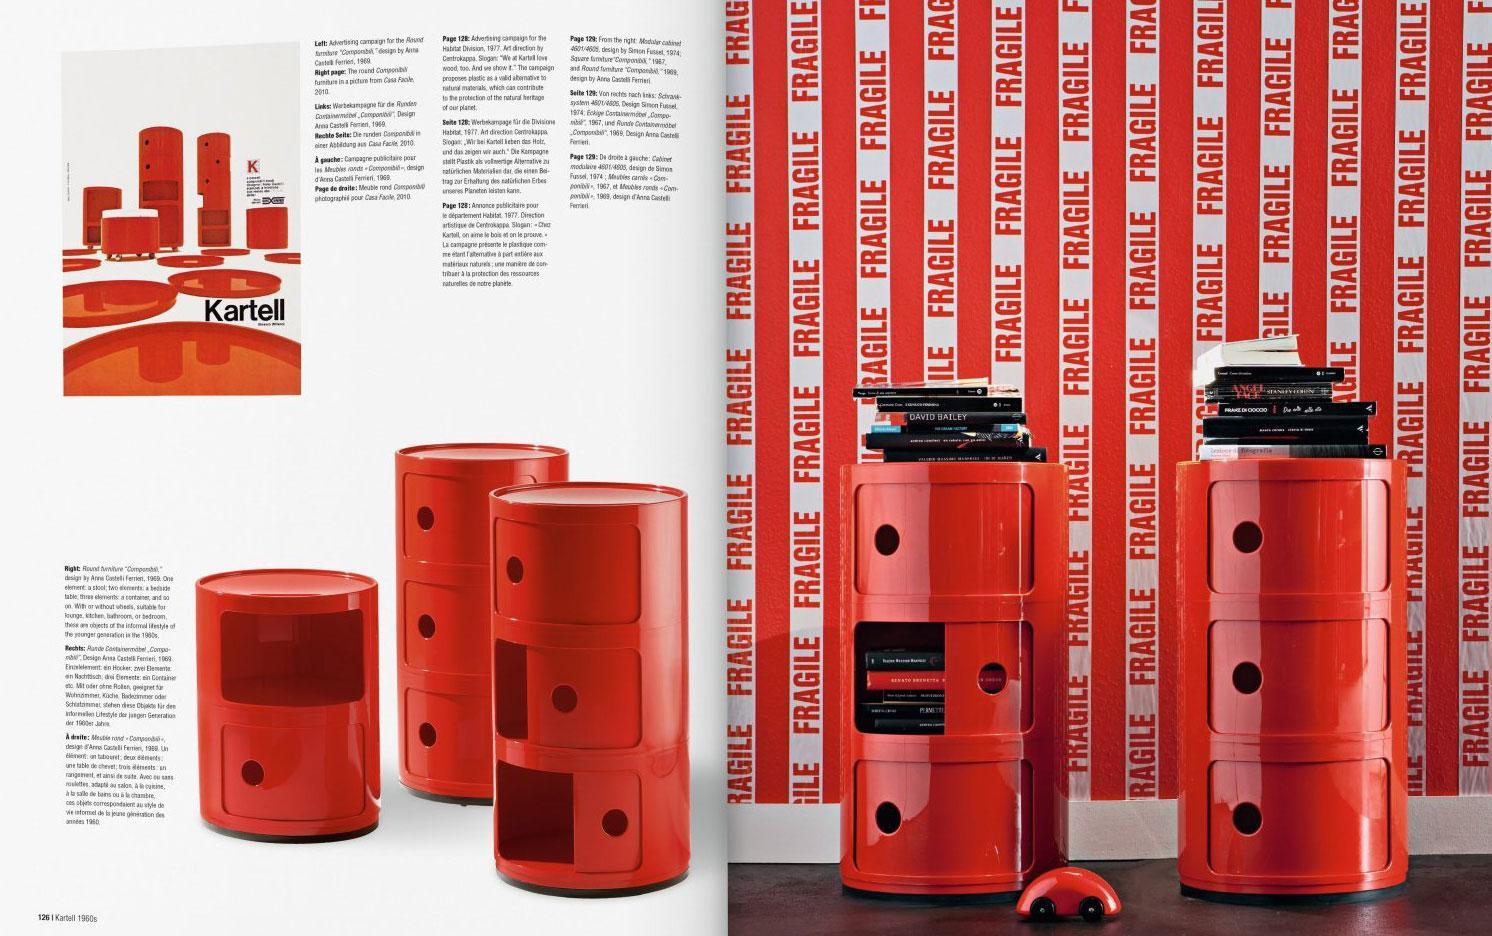 Dalani, Taschen, Idee, Design, Arte, Style, Moda